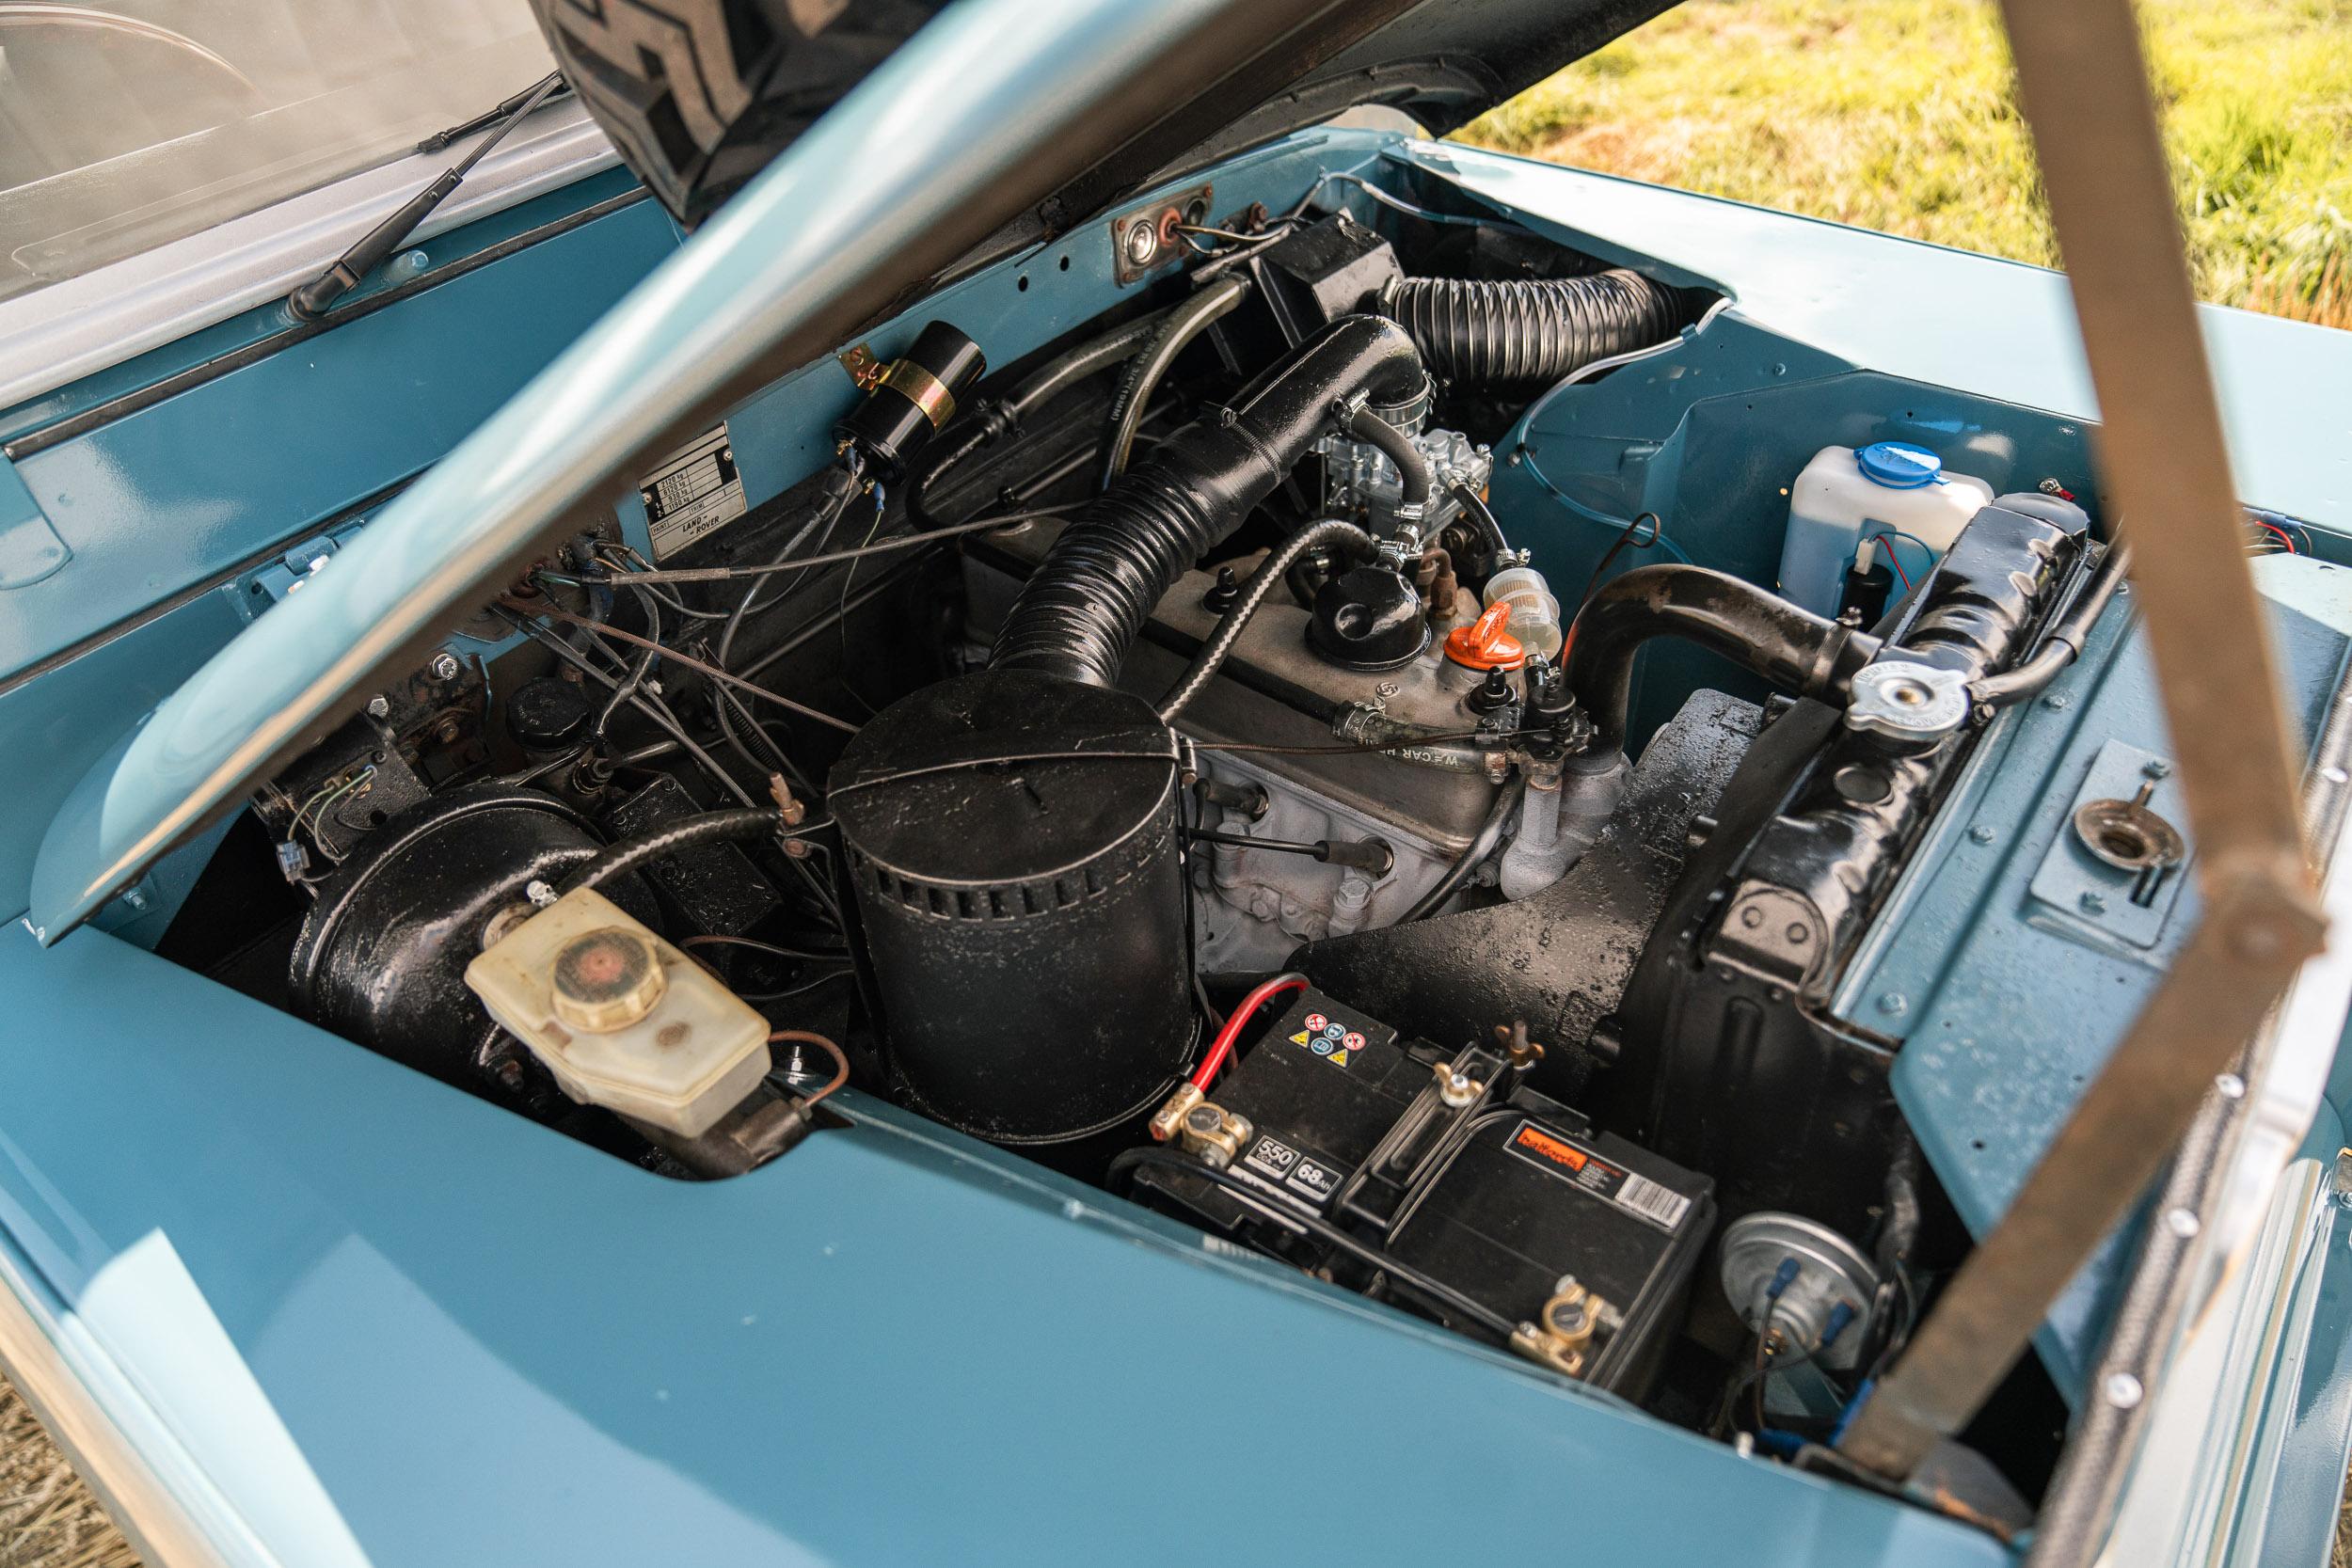 1982 Land Rover engine bay